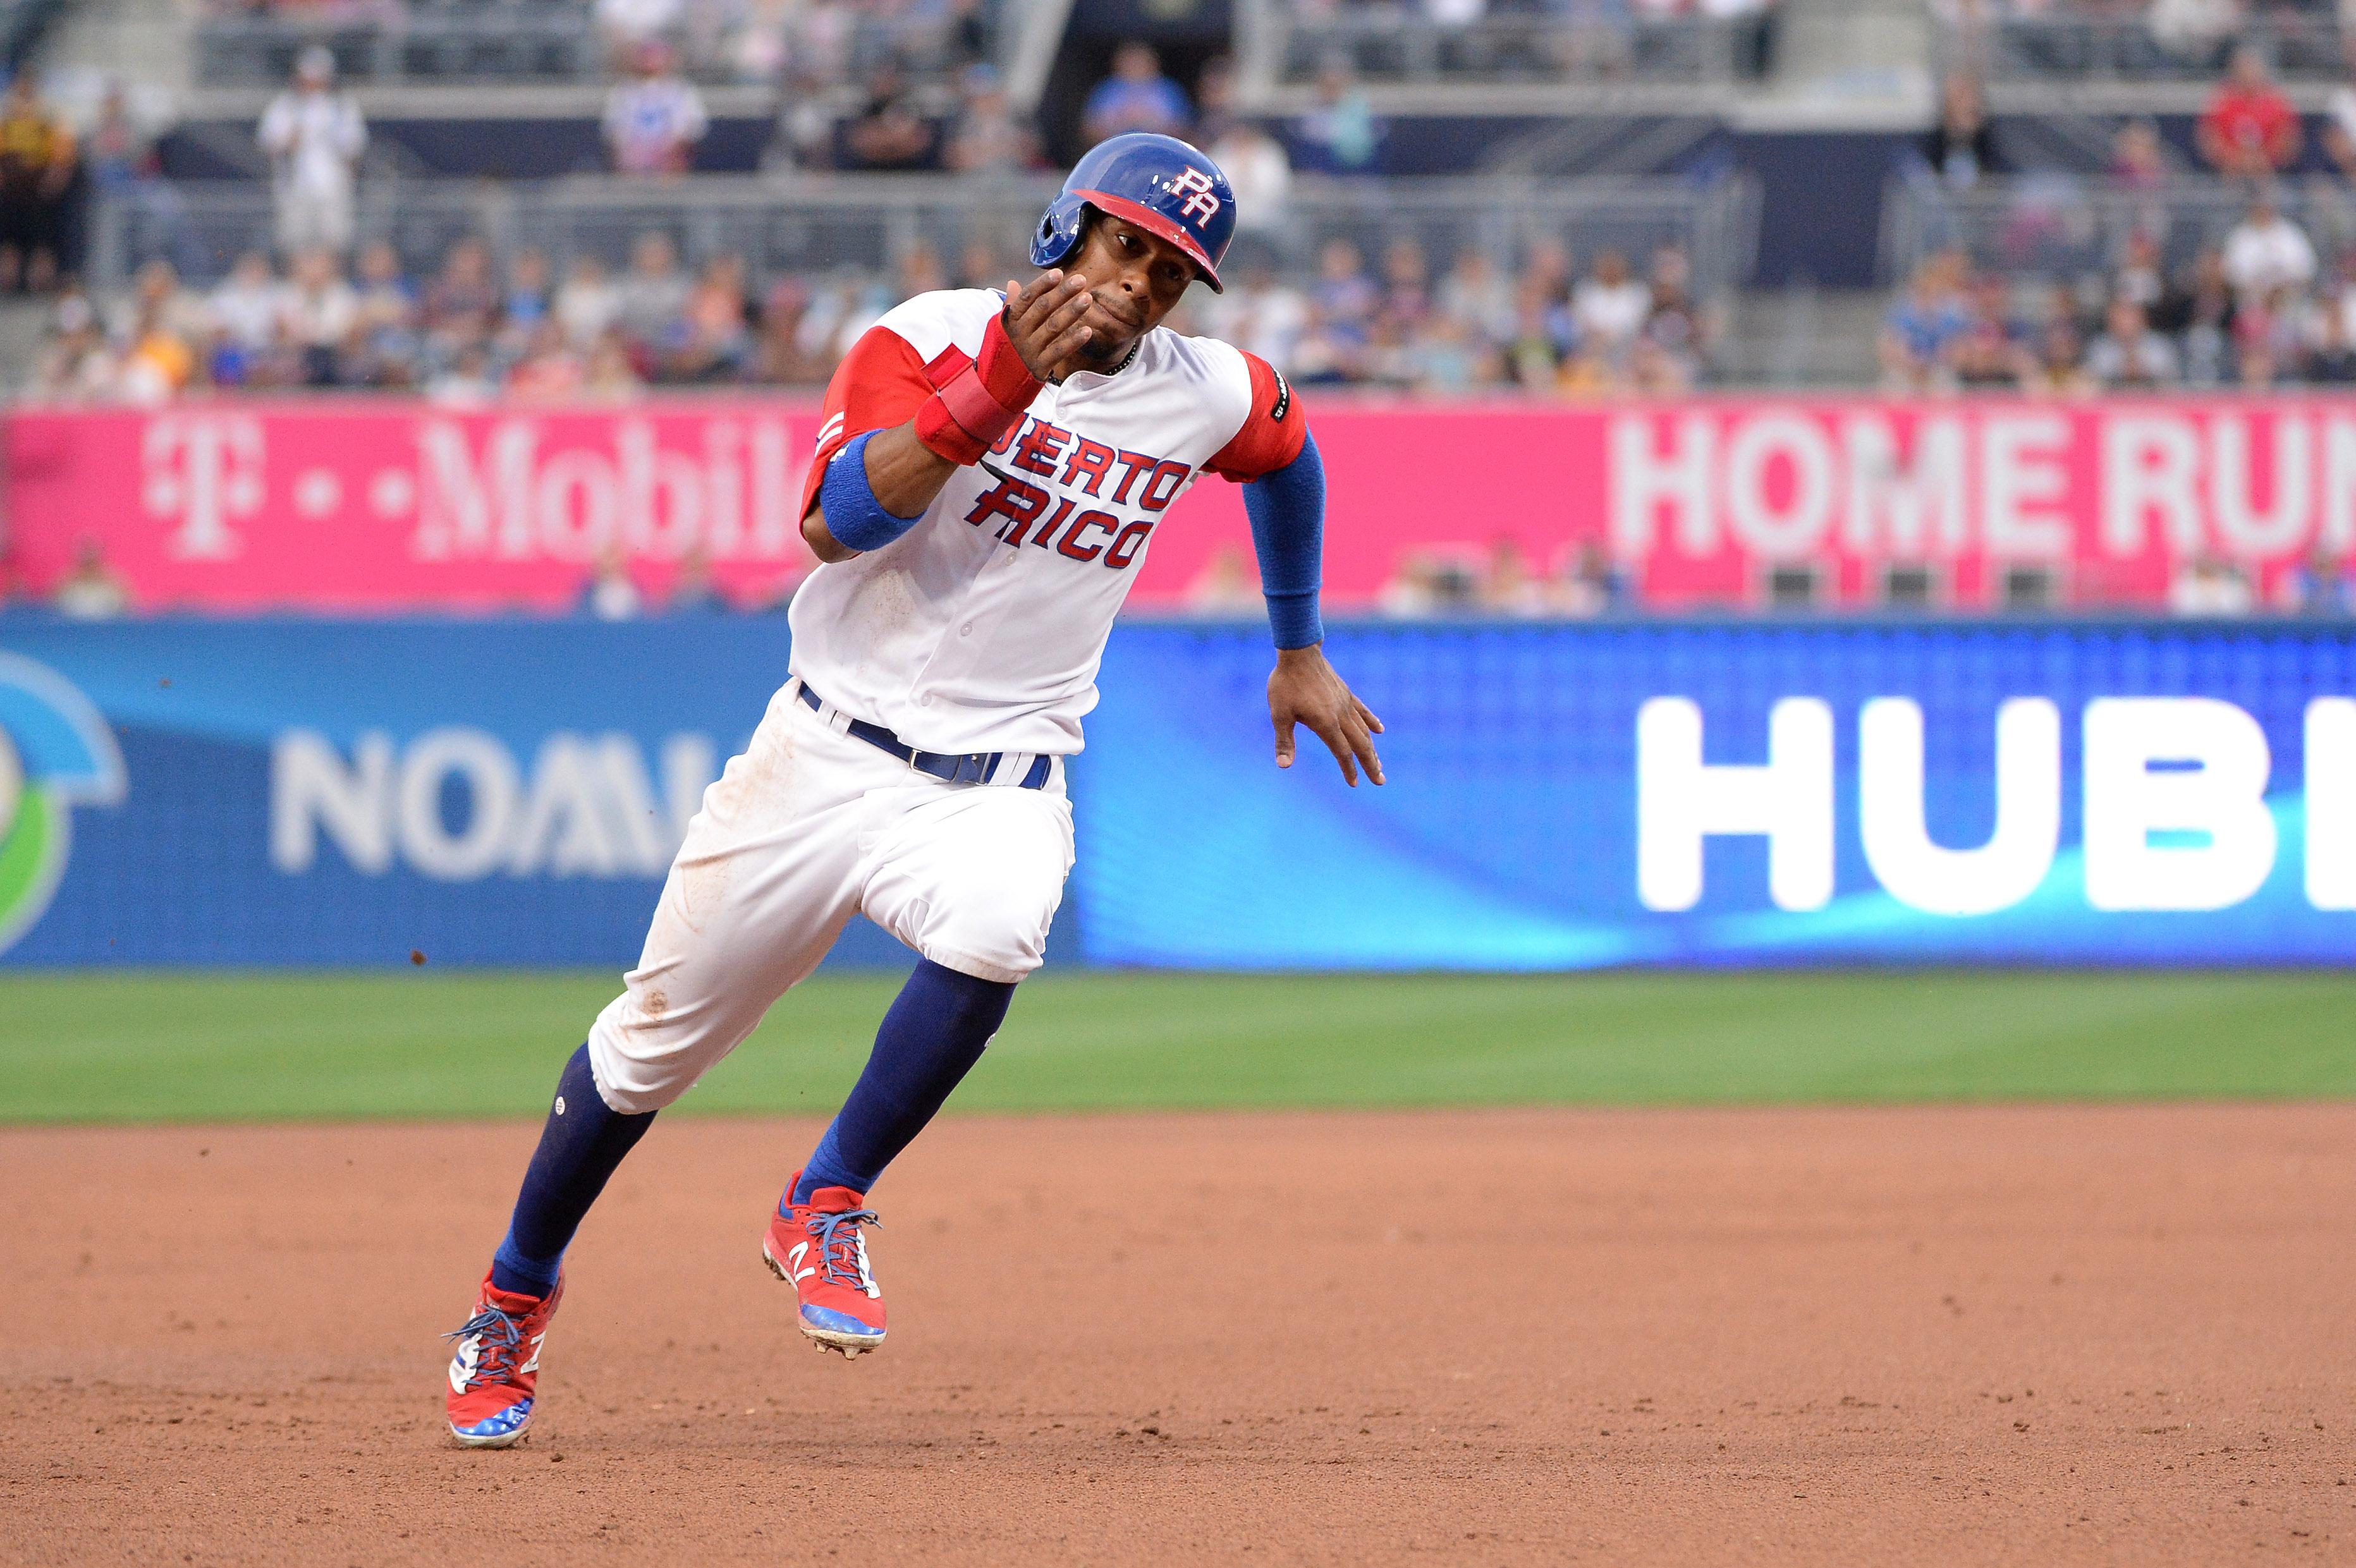 9943304-baseball-world-baseball-classic-dominican-republic-at-puerto-rico